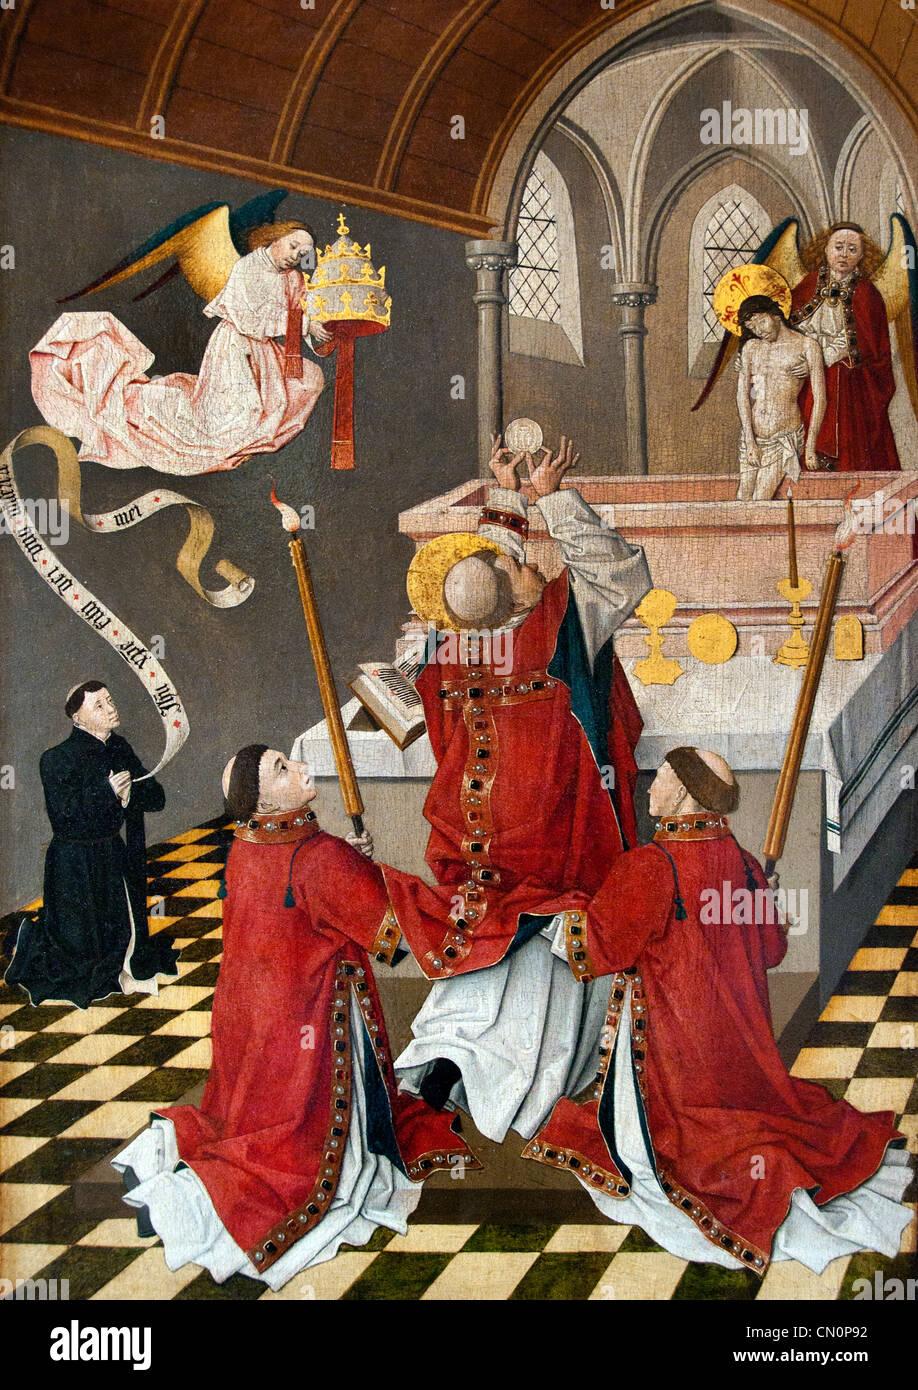 DIJON The Mass of St. Gregory Carthusian monastery La Messe de saint Grégoire la chartreuse Dijon Champmol Stock Photo